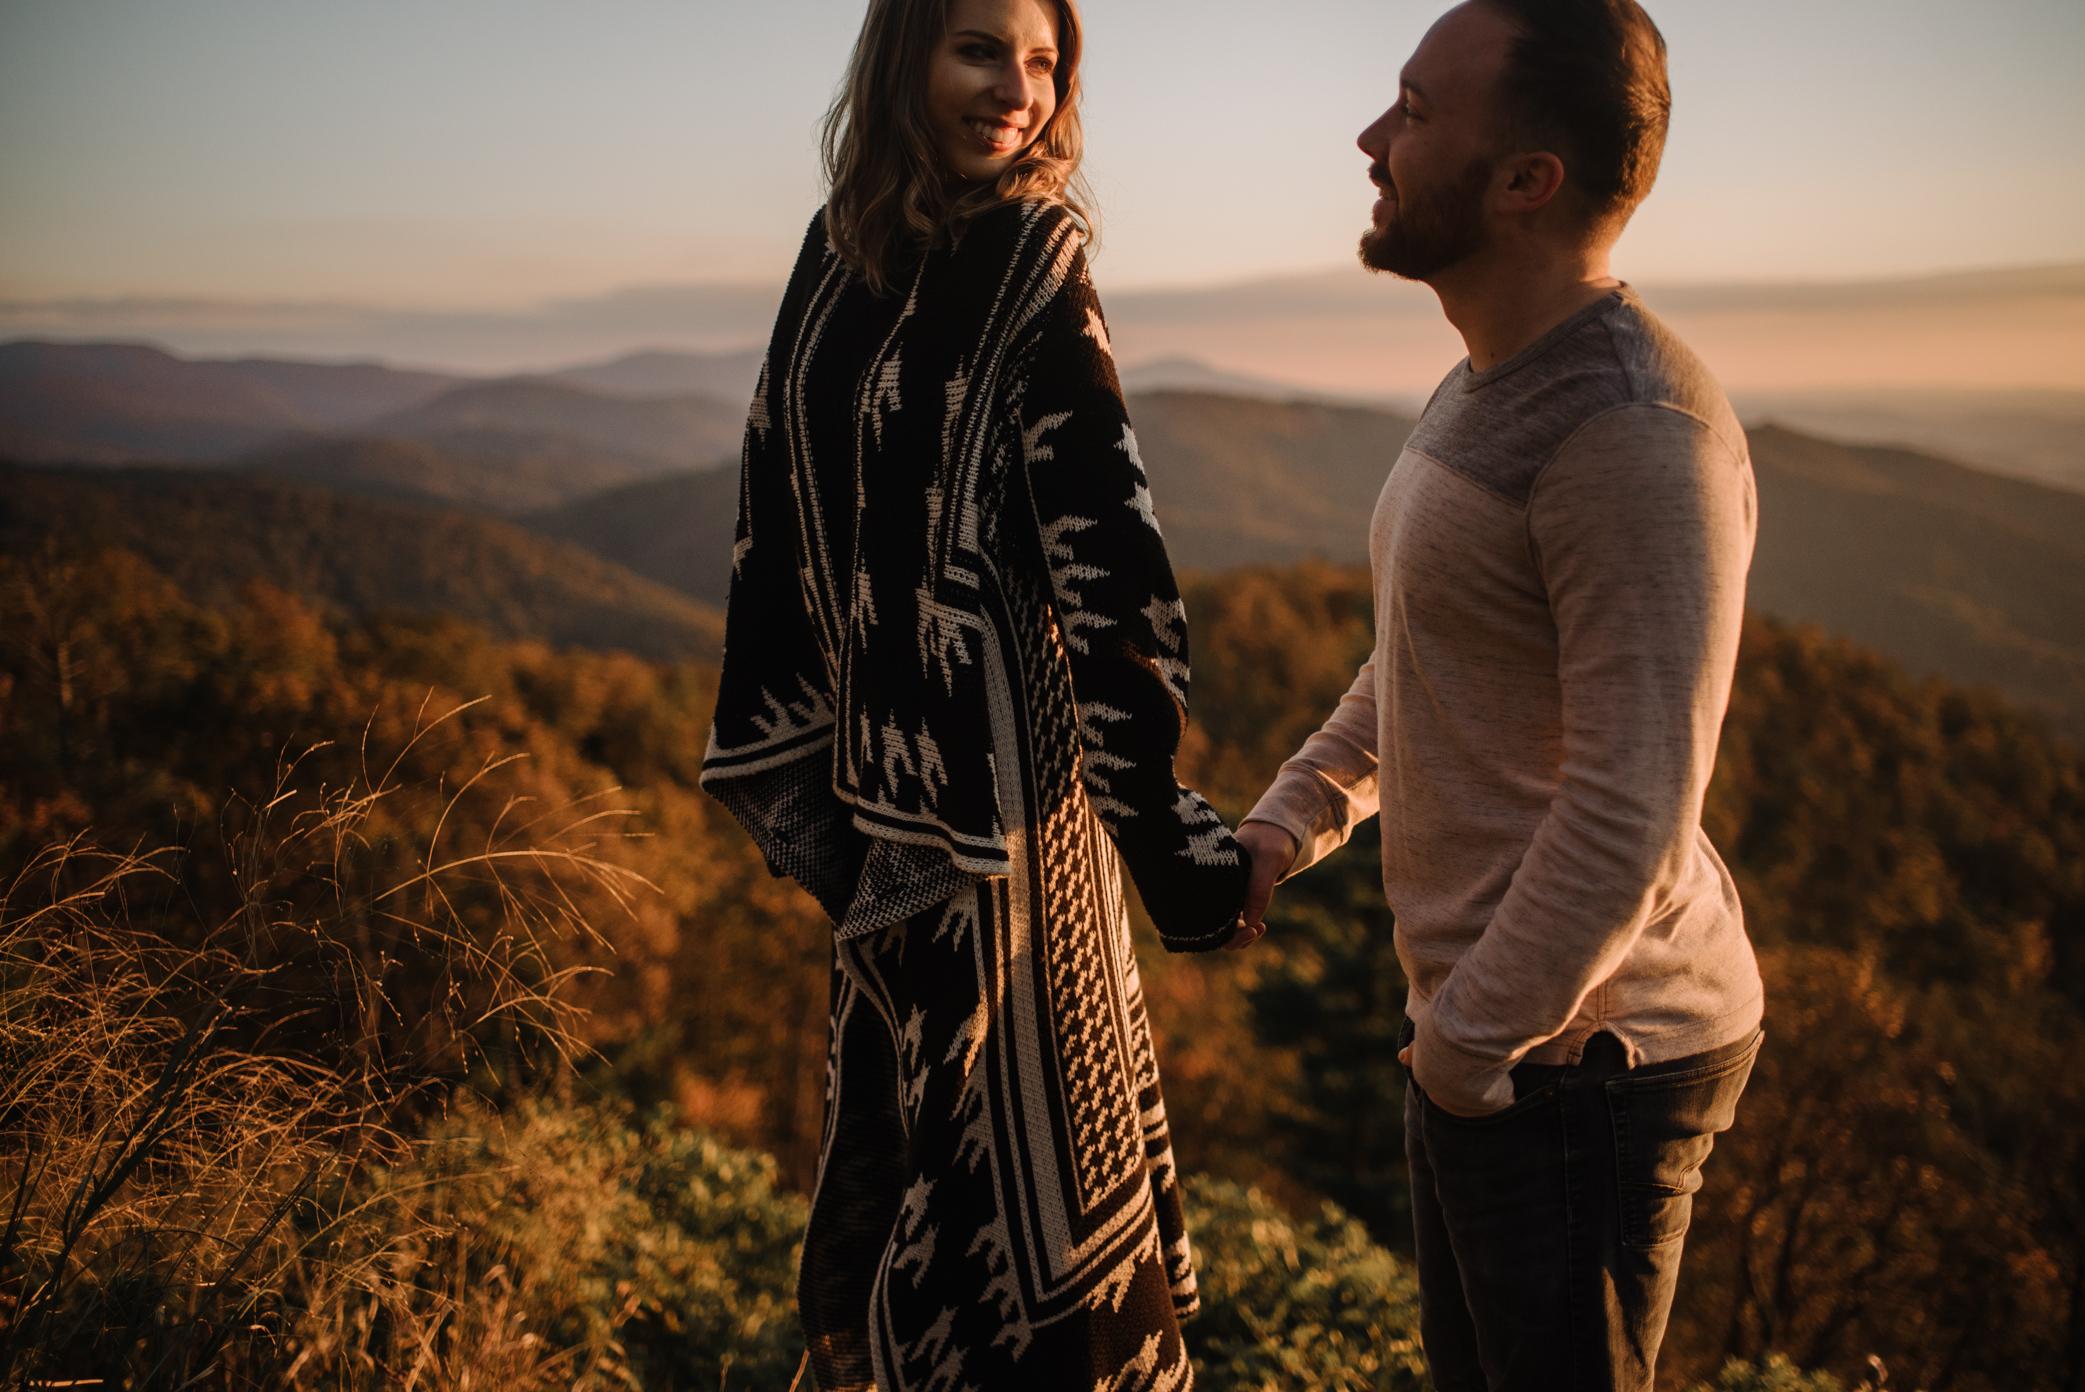 Macy and Mark - Shenandoah National Park - Fall Autumn Sunrise Couple Adventure Session - White Sails Creative - Mini Session_24.JPG